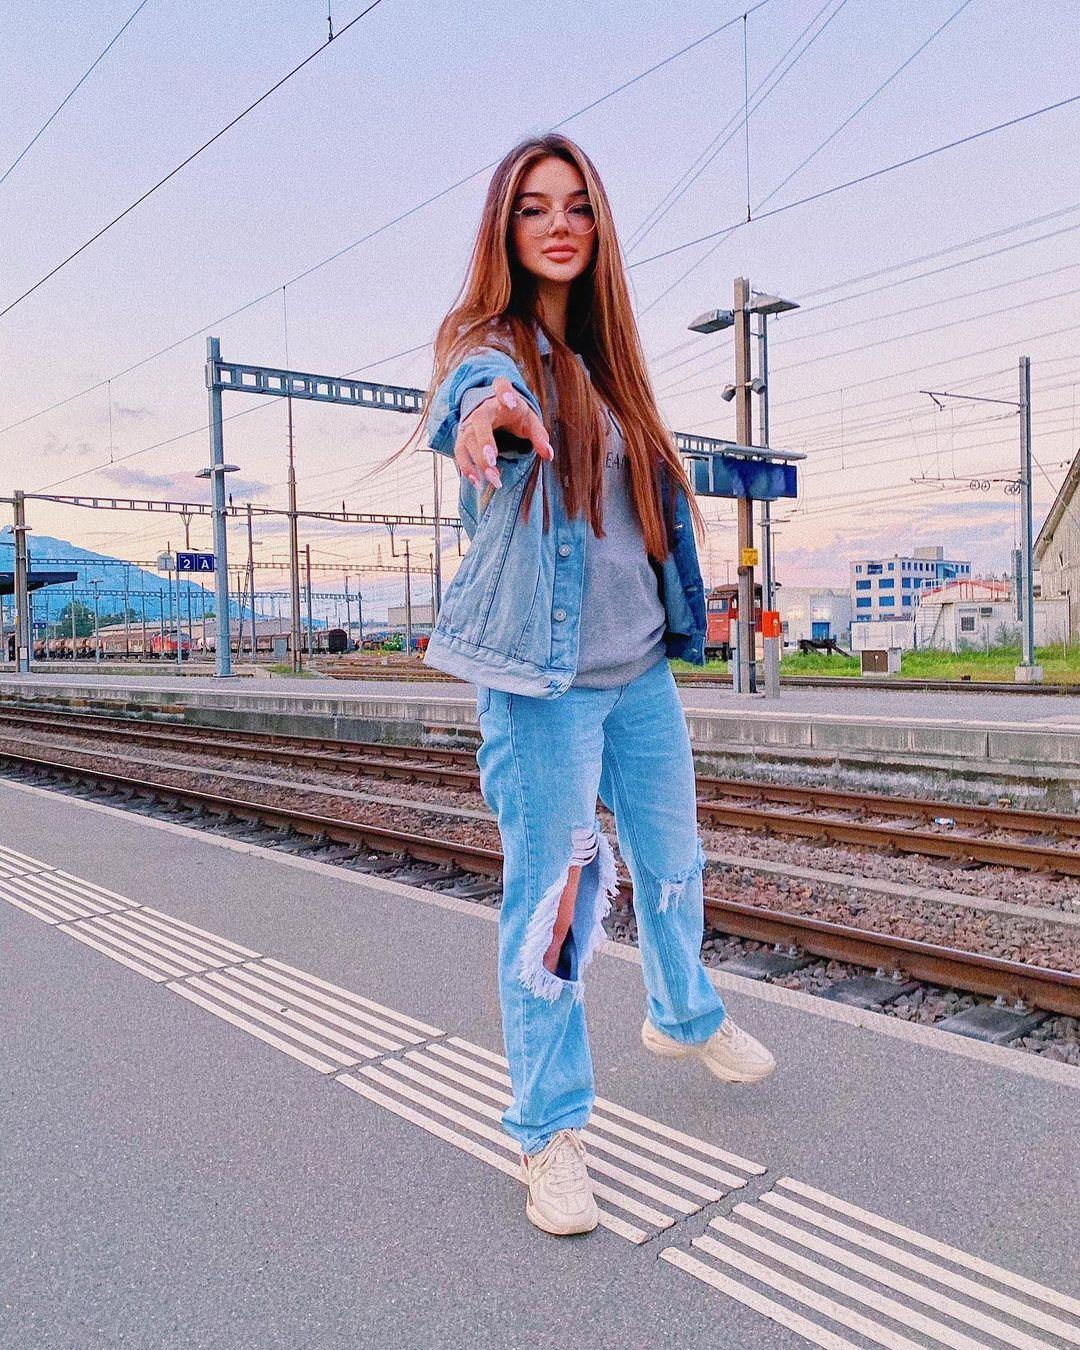 Dzana-Dzzyzzle-Wallpapers-Insta-Fit-Bio-9